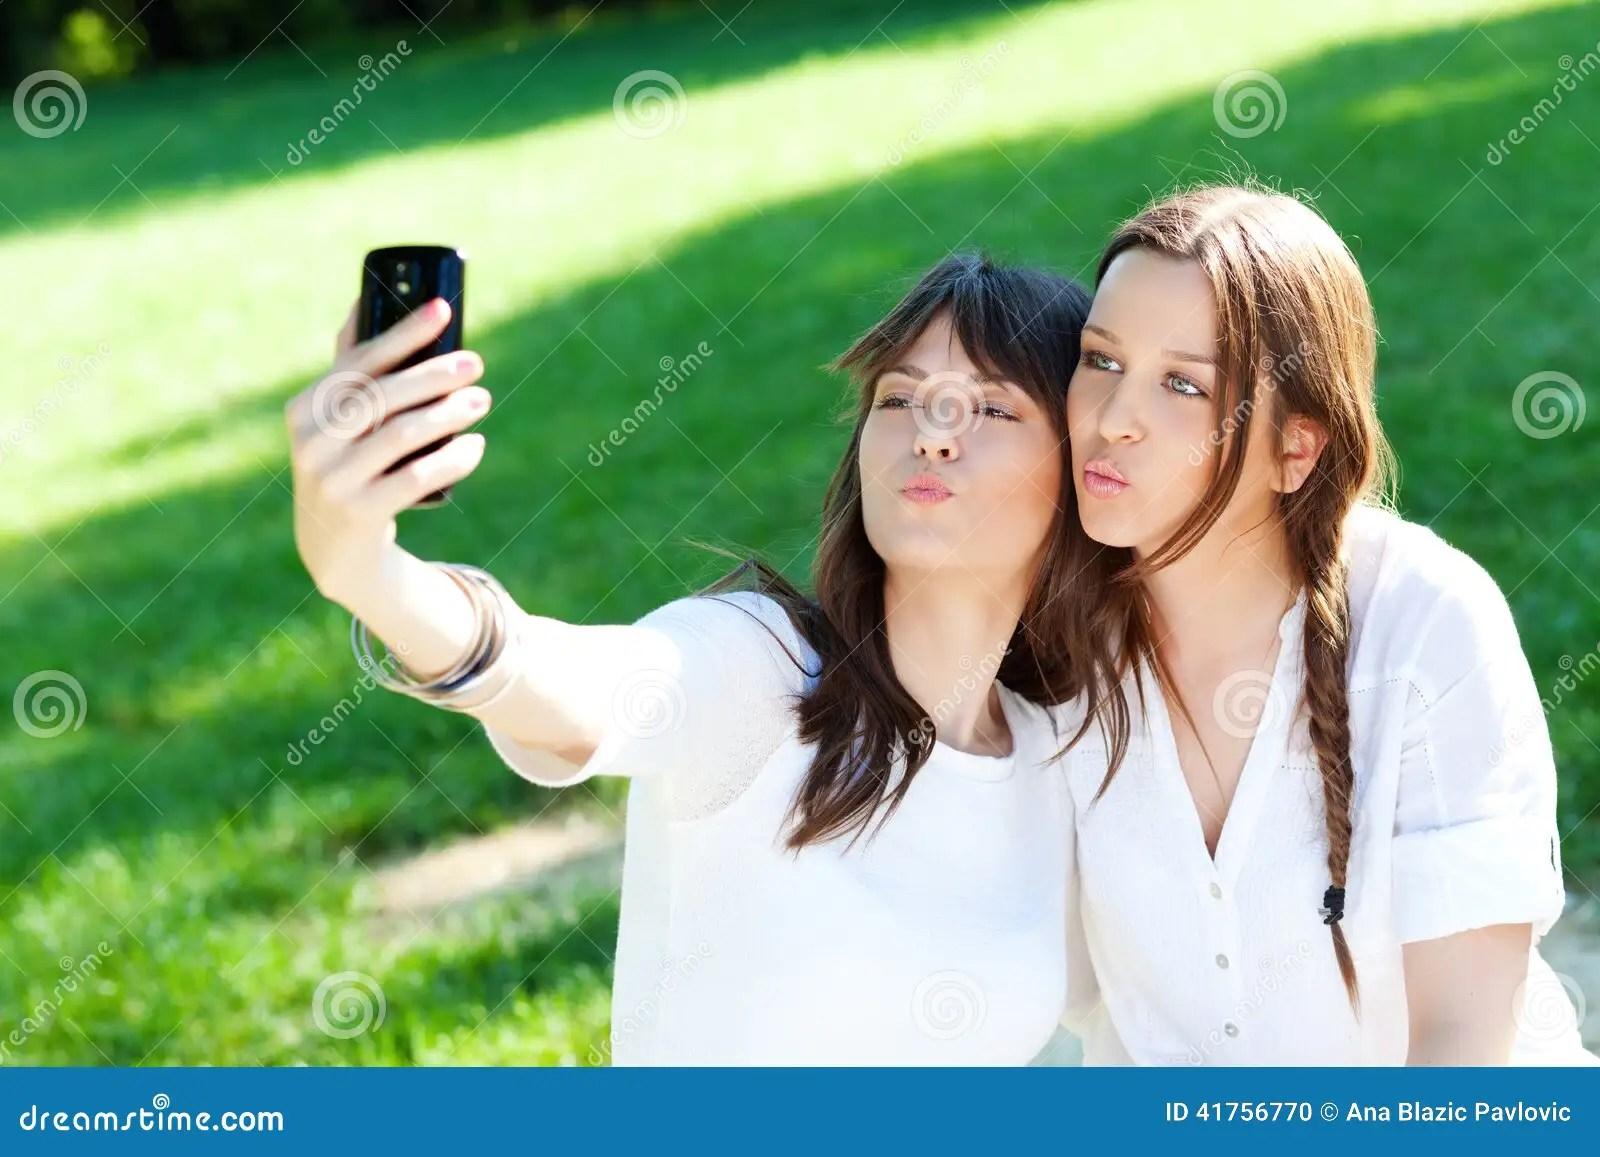 Taking Selfie Stock Photo Image 41756770